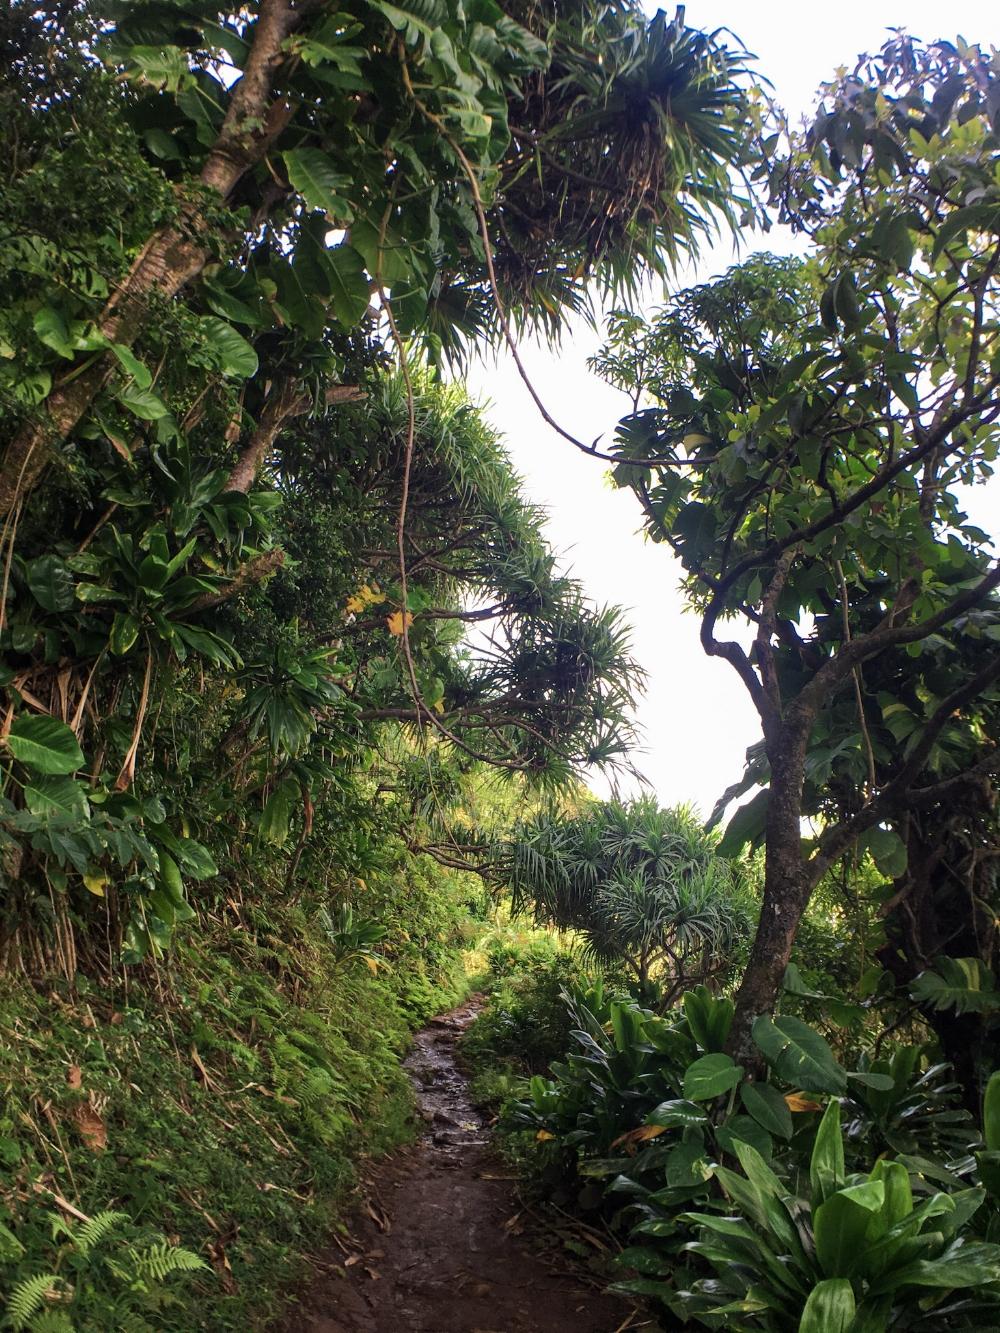 curio.trips.hawaii.kauai.hike.1.jpg